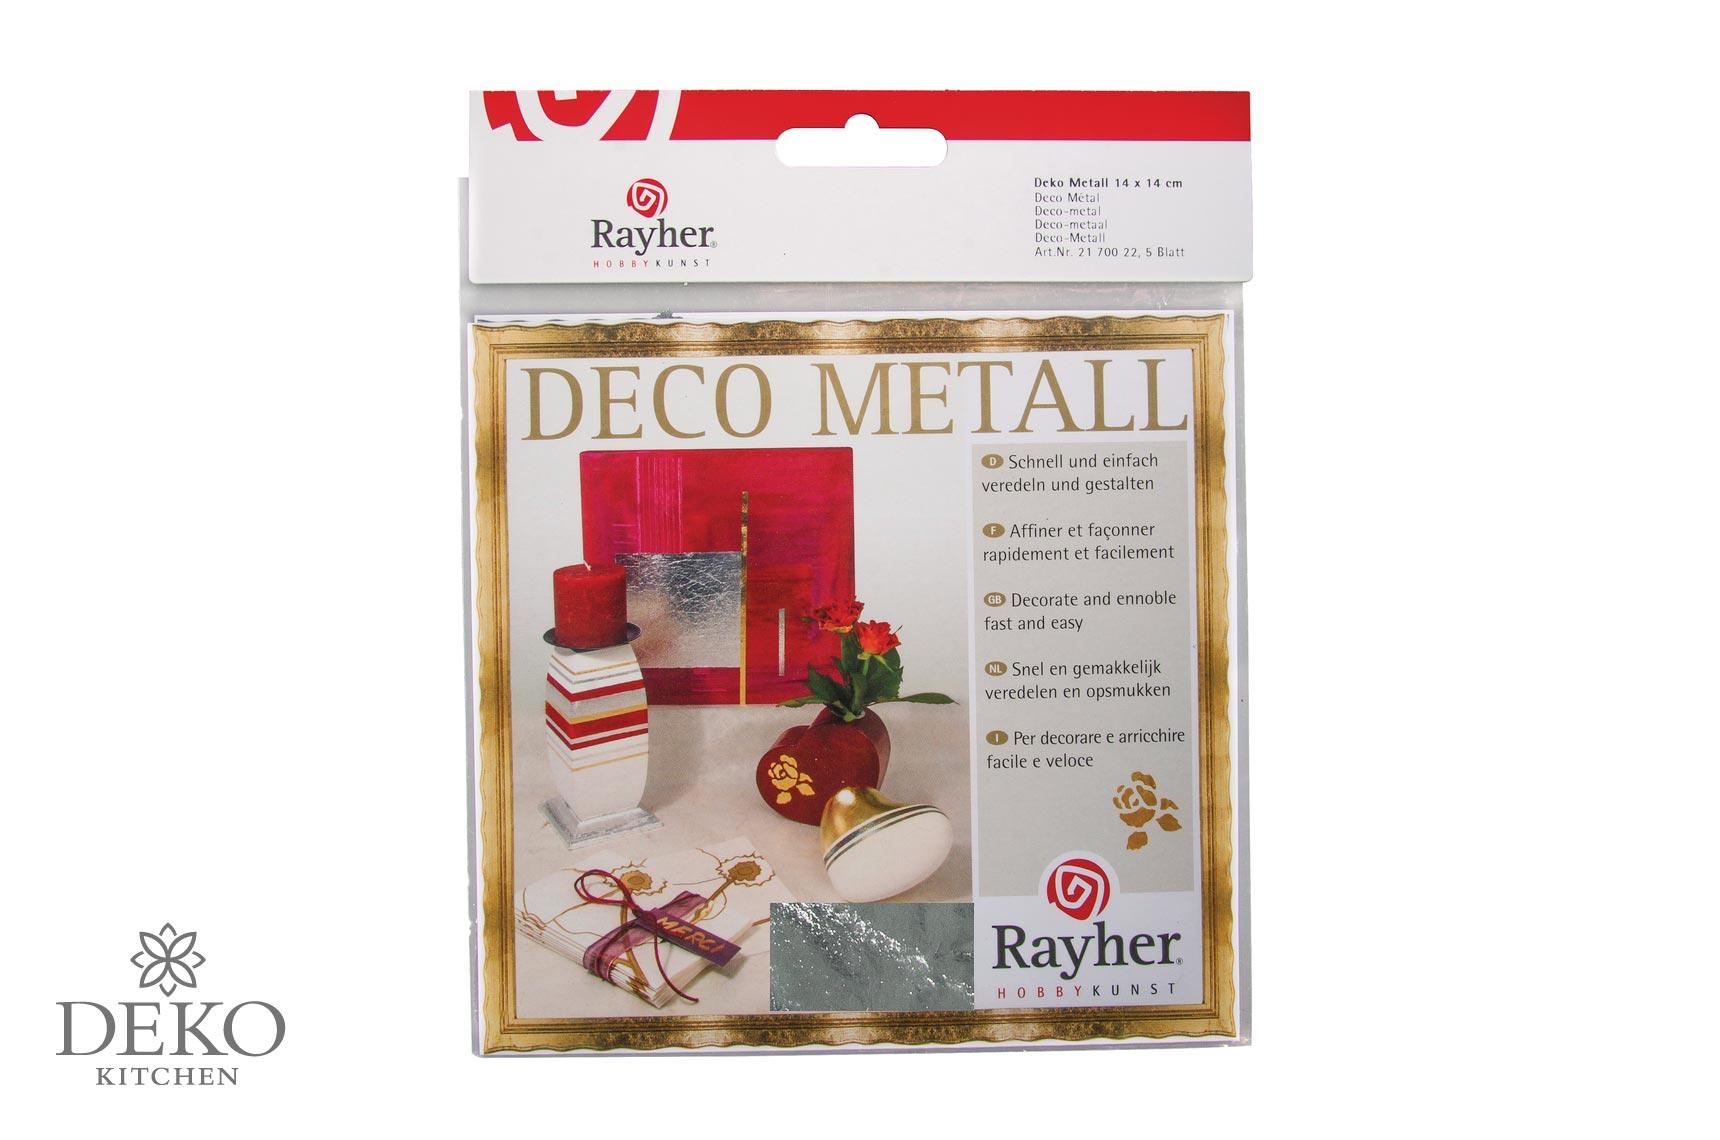 deco metall 5 blatt silber deko kitchen shop. Black Bedroom Furniture Sets. Home Design Ideas